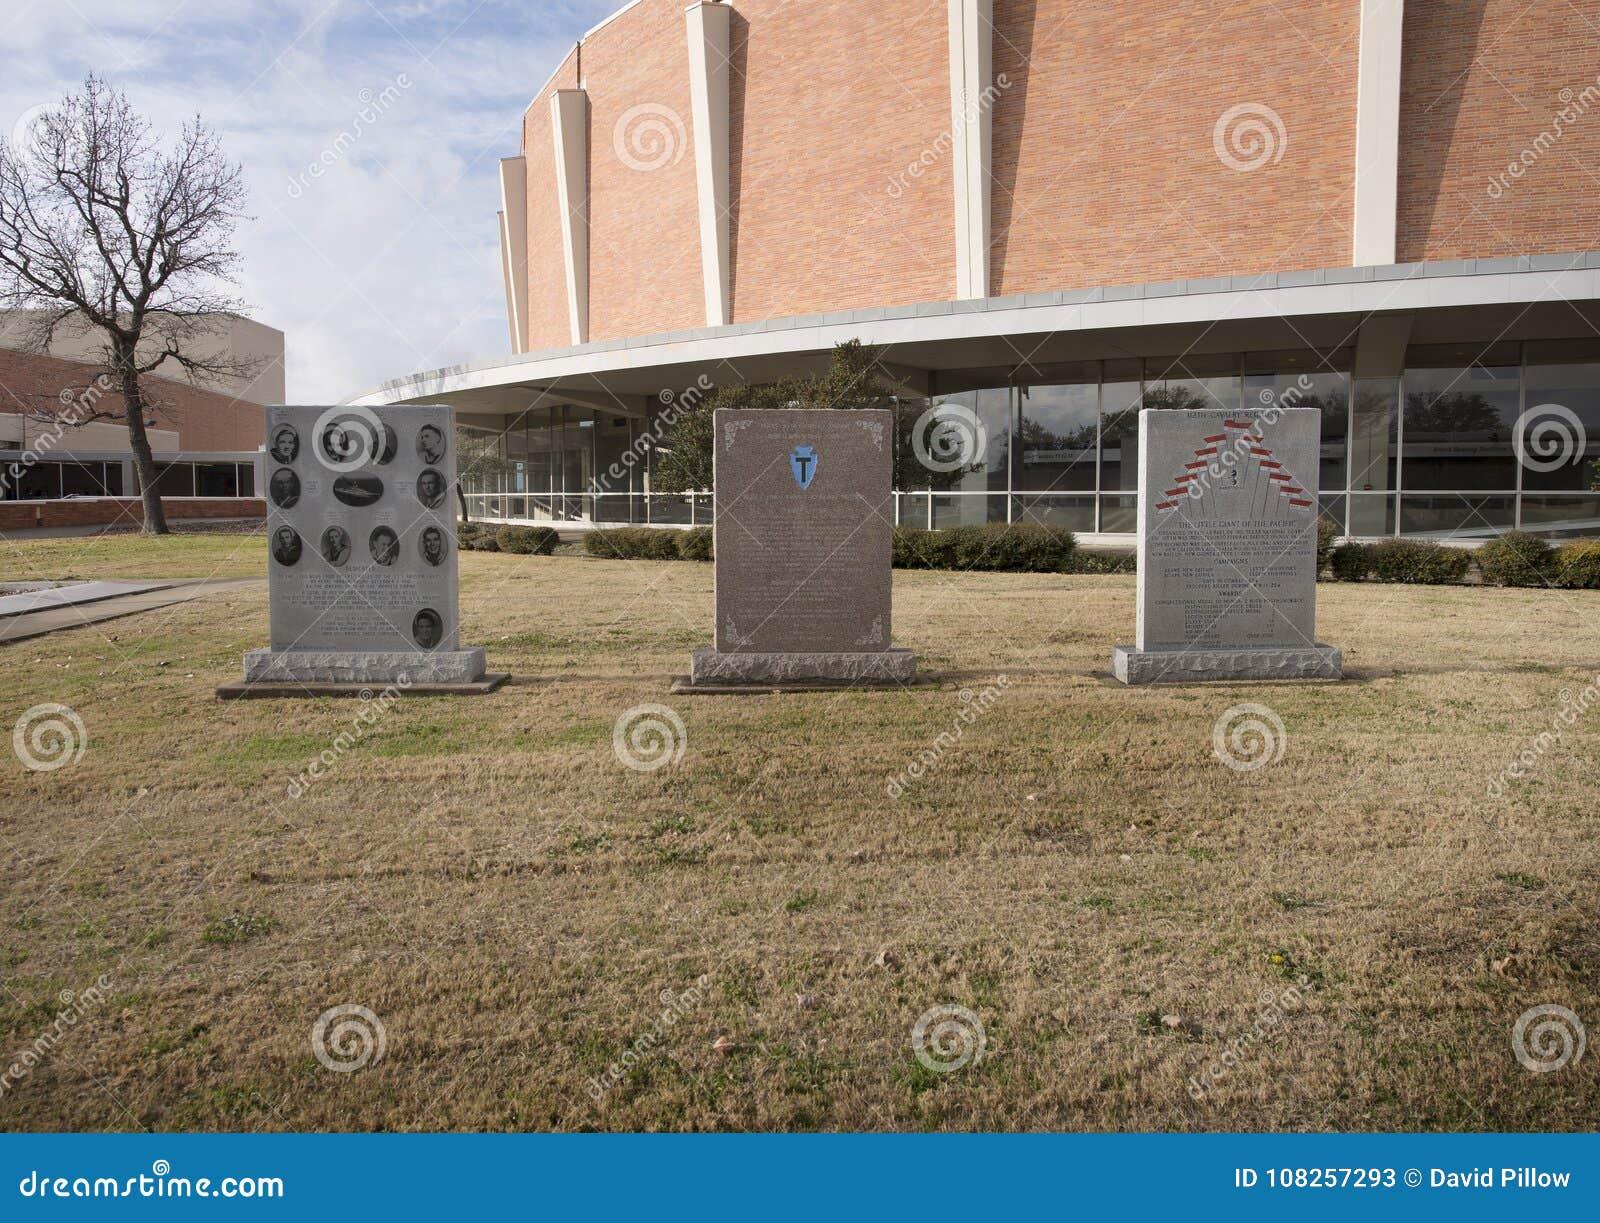 War monuments in the Veterans Memorial Garden with Dallas Memorial Auditorium in the background.